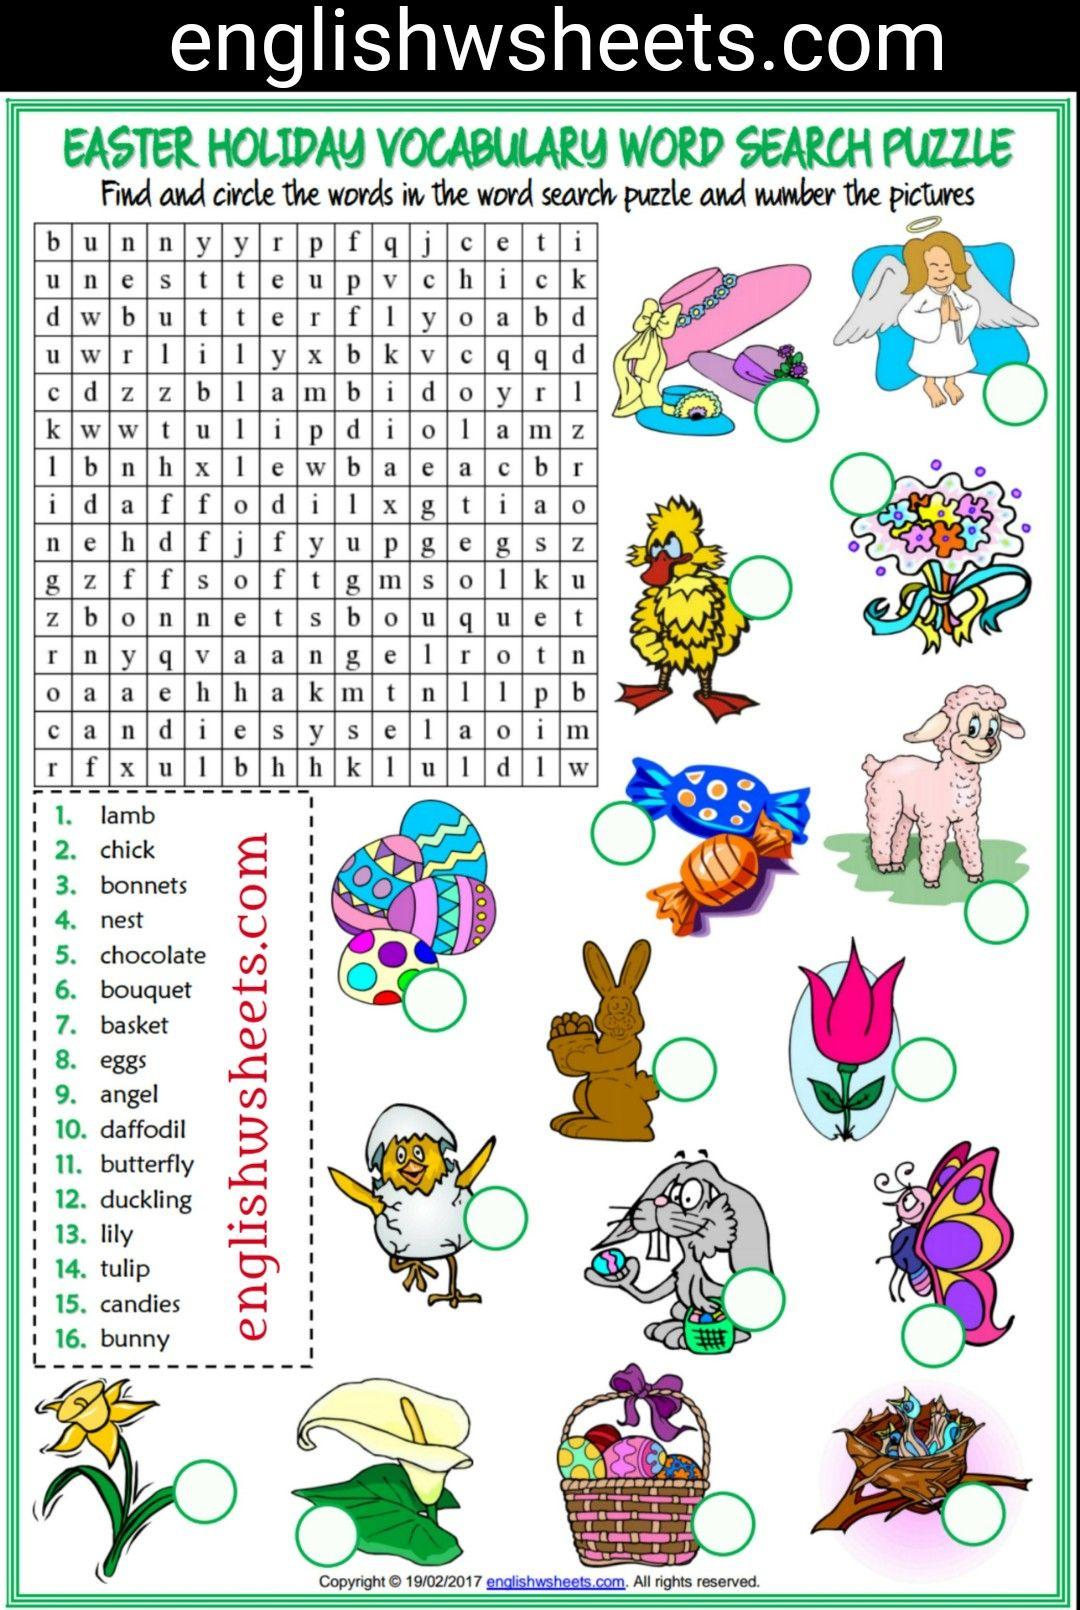 worksheet Grammar Puzzle Worksheets easter esl printable word search puzzle worksheet for kids printable